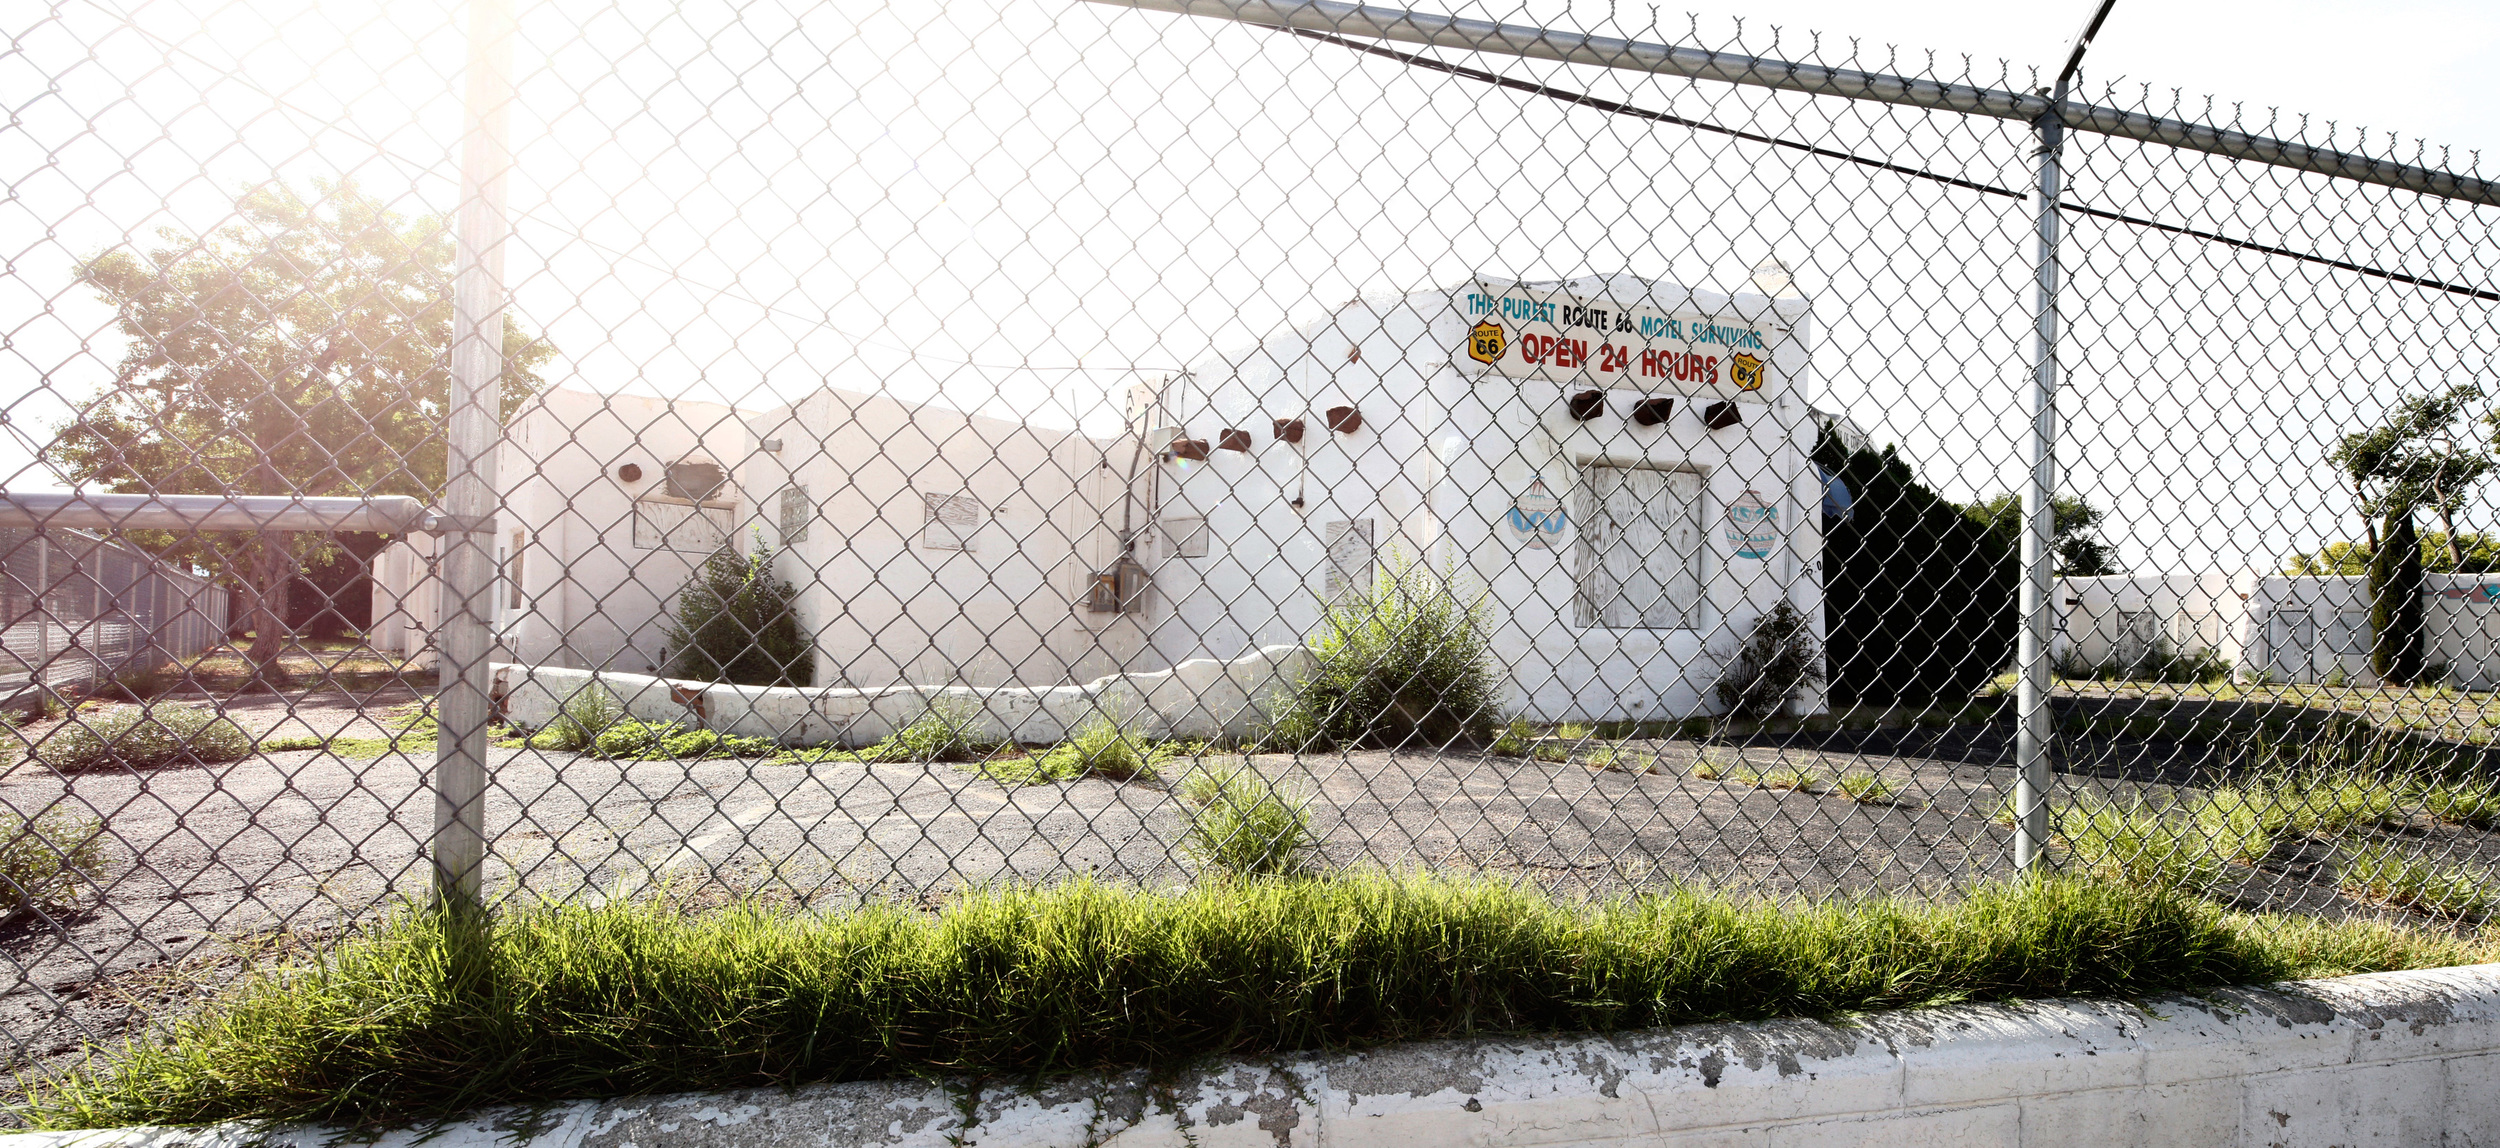 Rt.-66-Motel.jpg